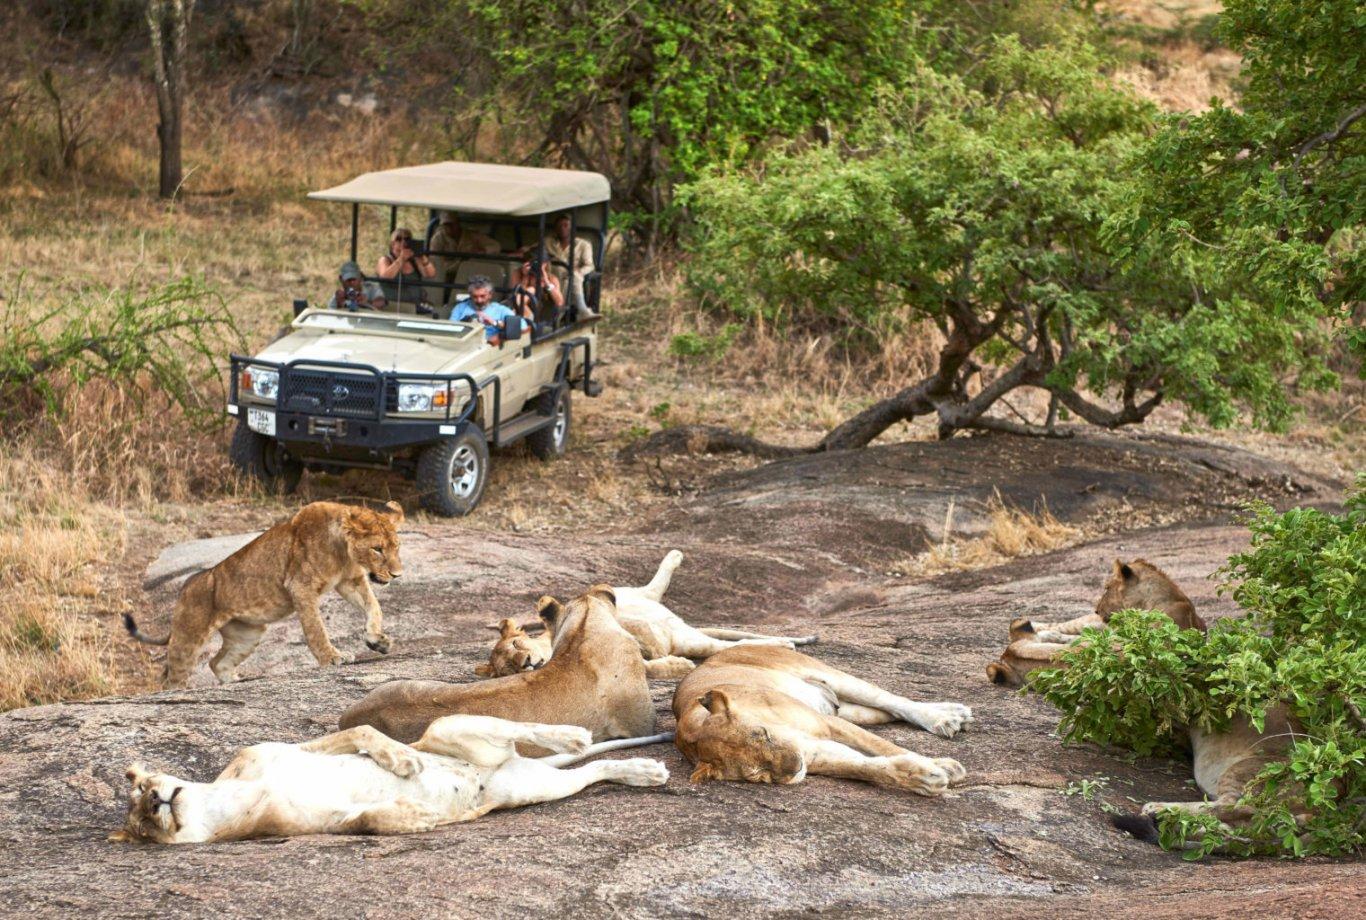 8-Day-Tanzania-Wildlife-Safari-and-Cultural-Tourism-.jpg